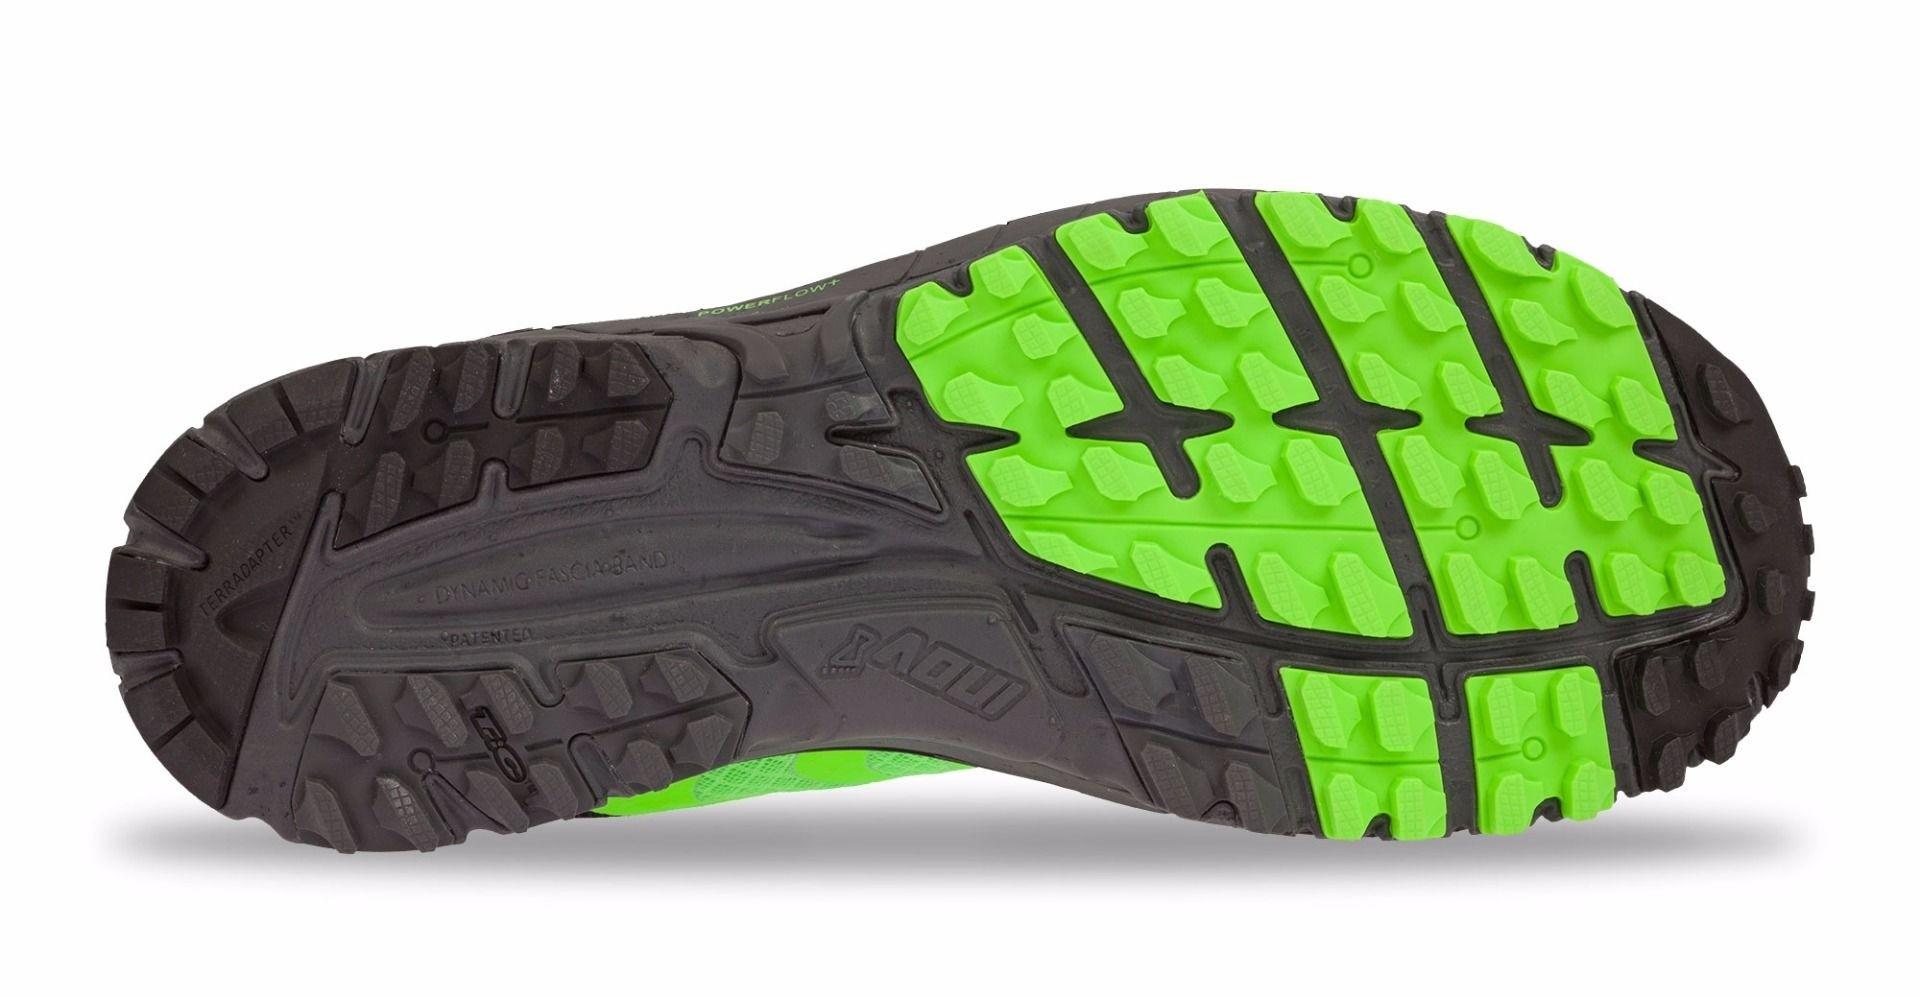 Inov8 Parkclaw 275-m-green-black-sole-update.jpg